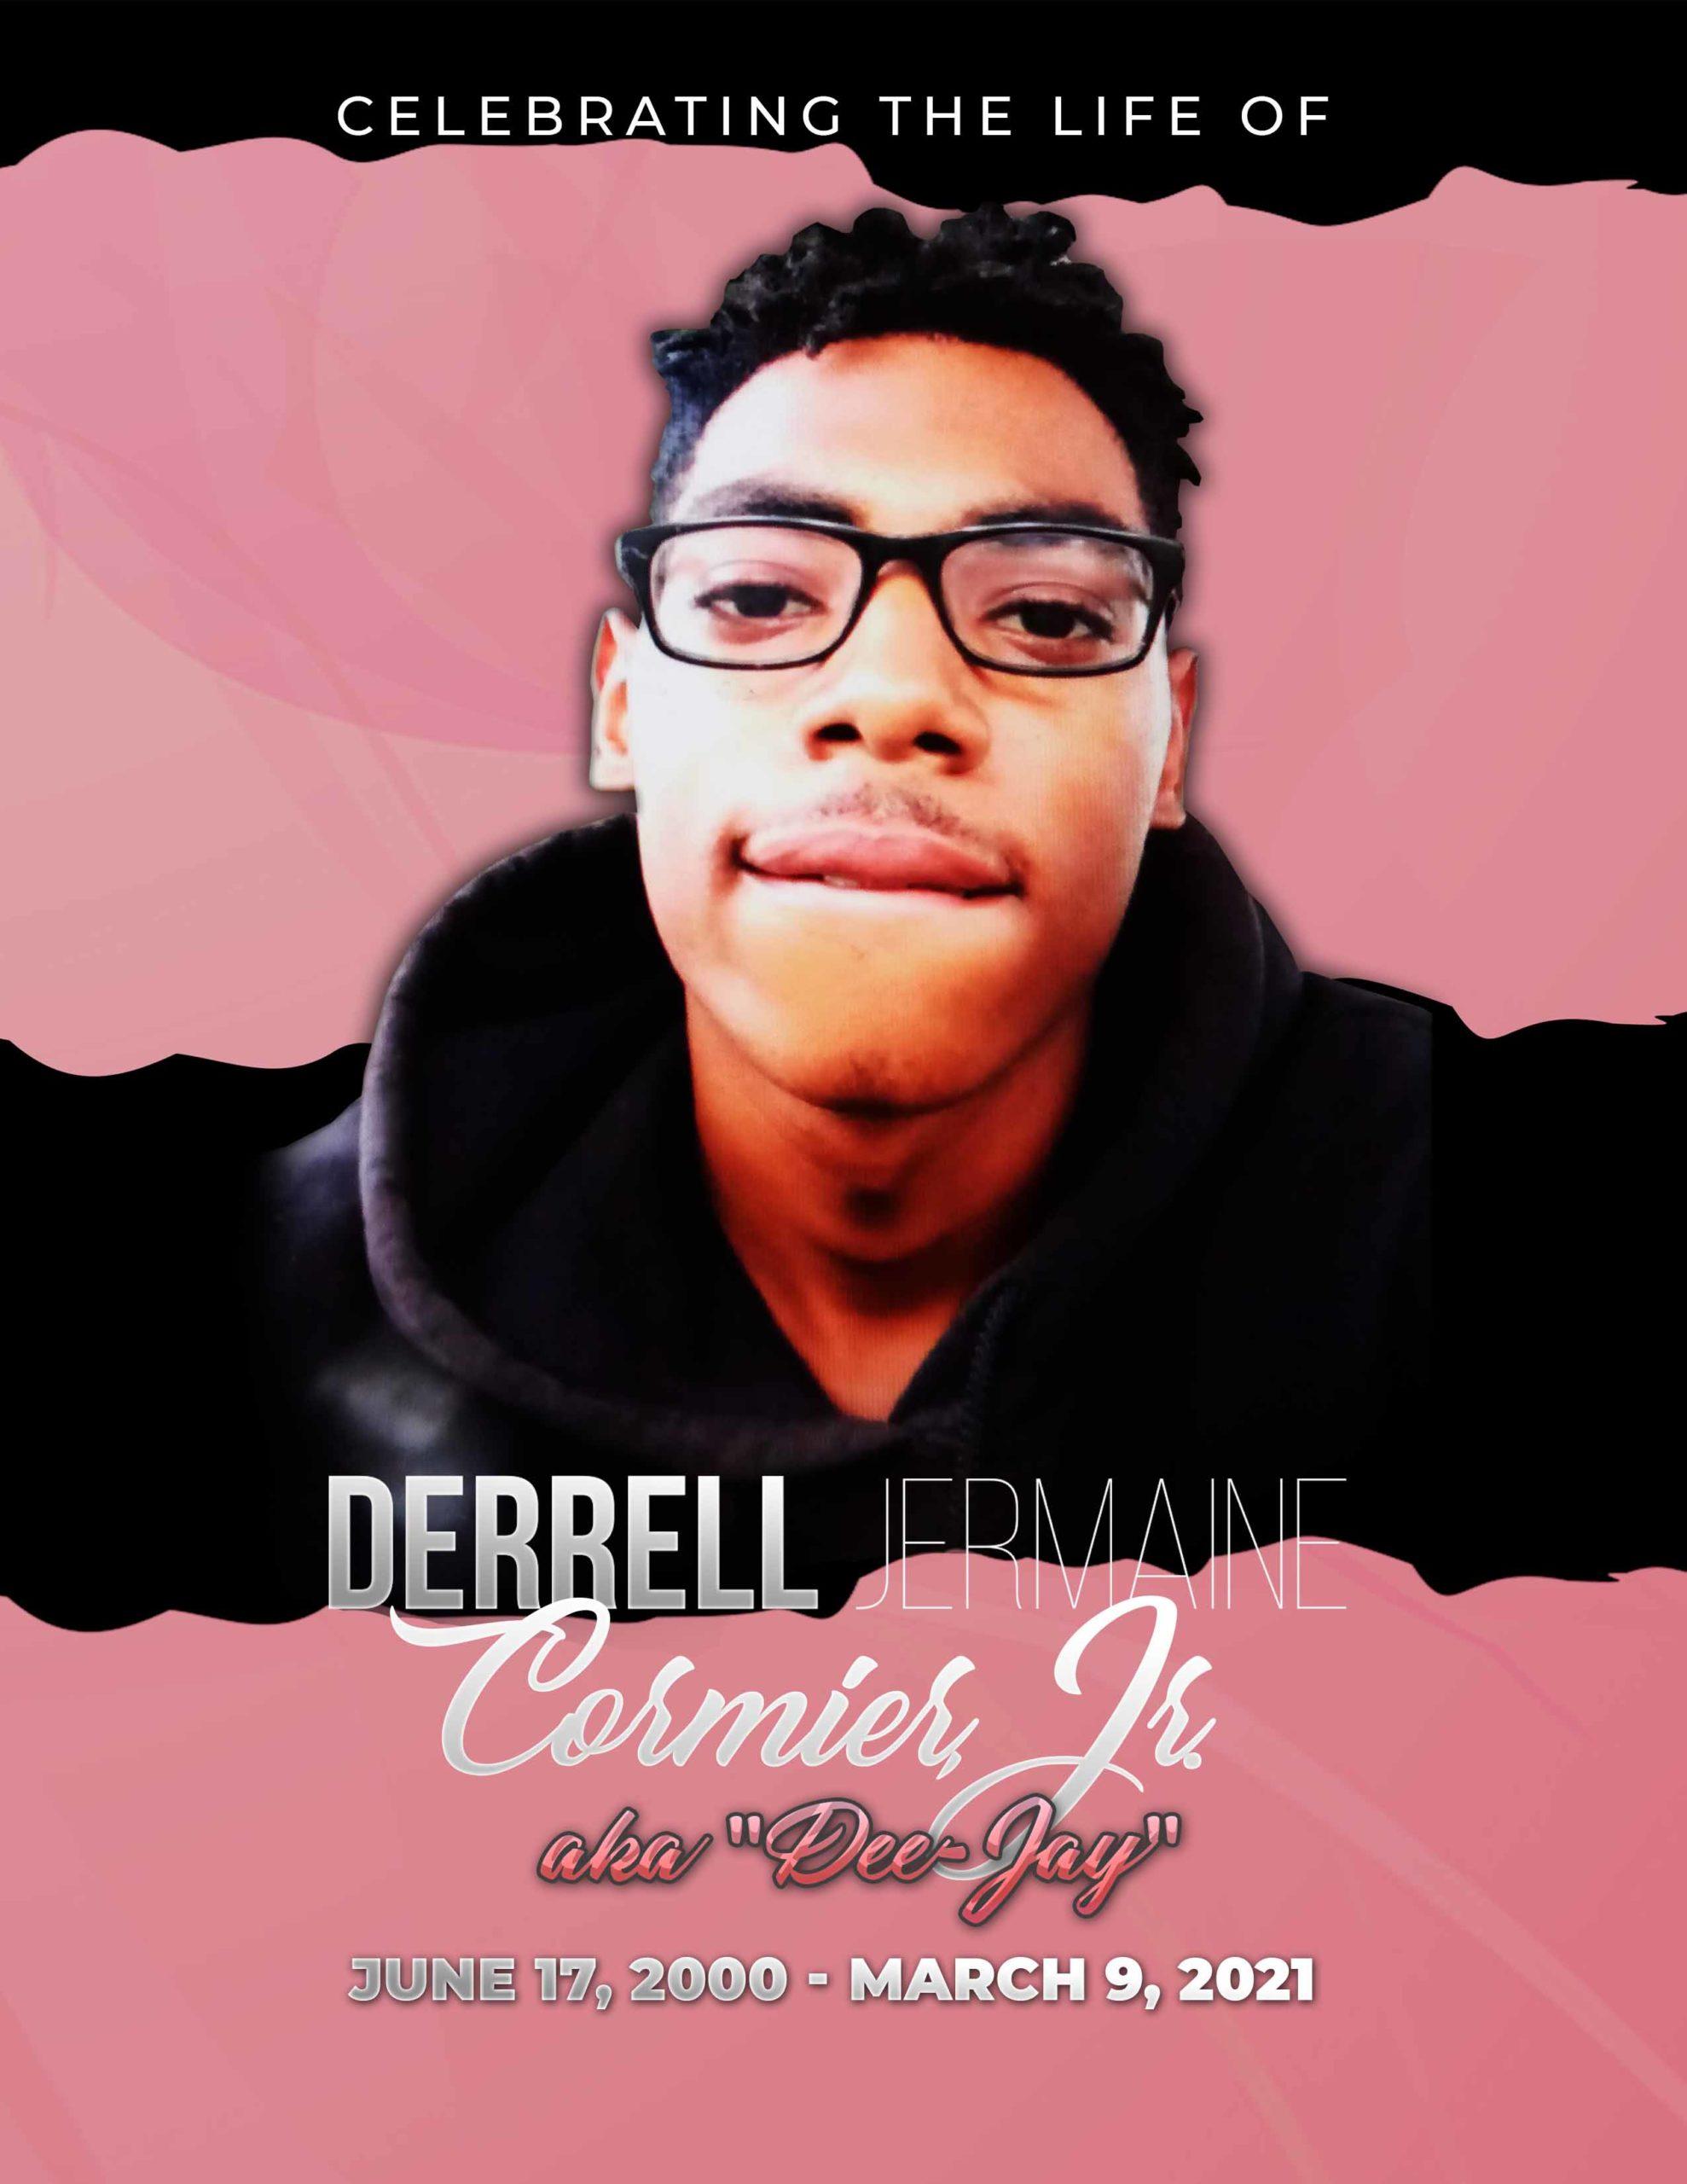 Derrell Jermaine Cormier, Jr. 2000-2021